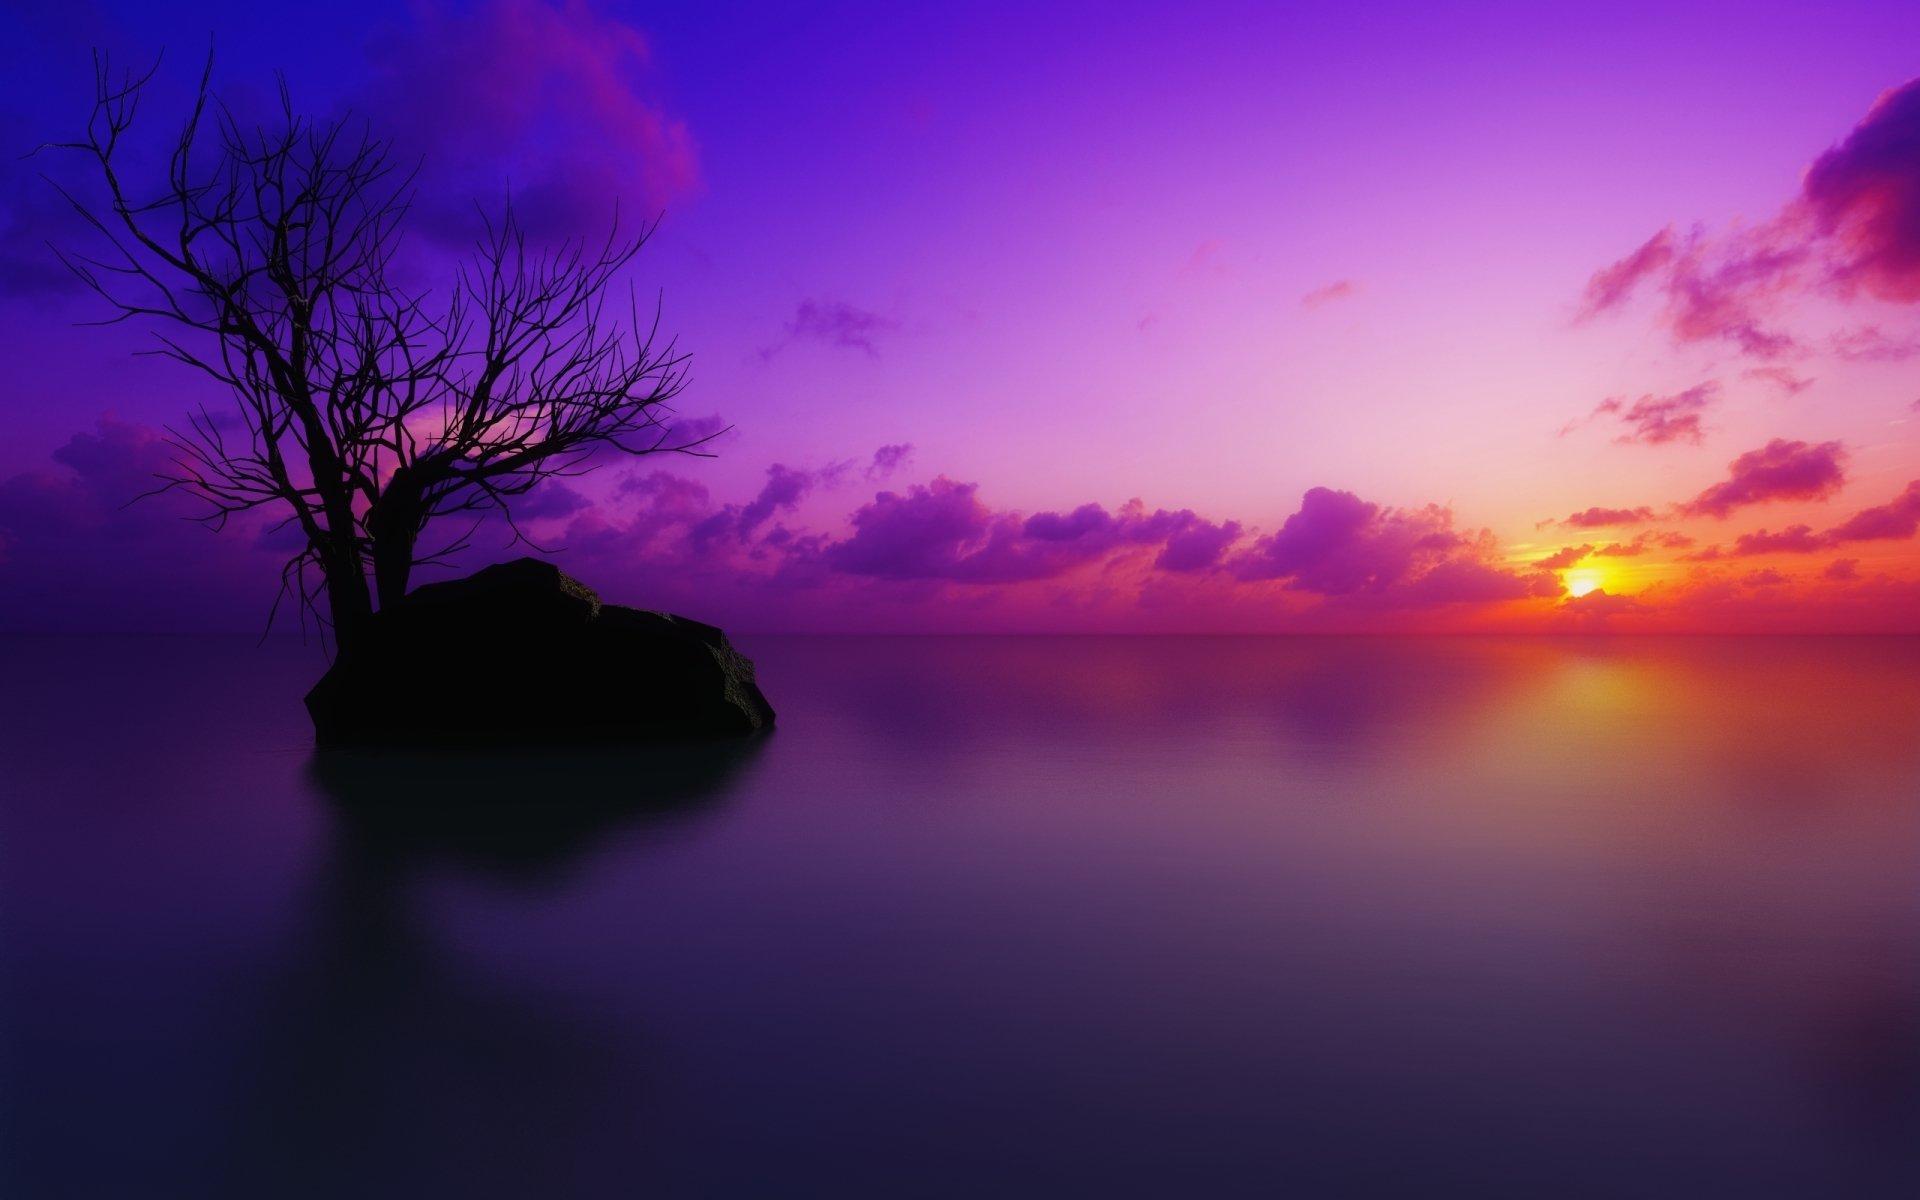 Earth - Scenic  Sunset Ocean Pastel Tree Artistic Purple Cloud Rock Wallpaper